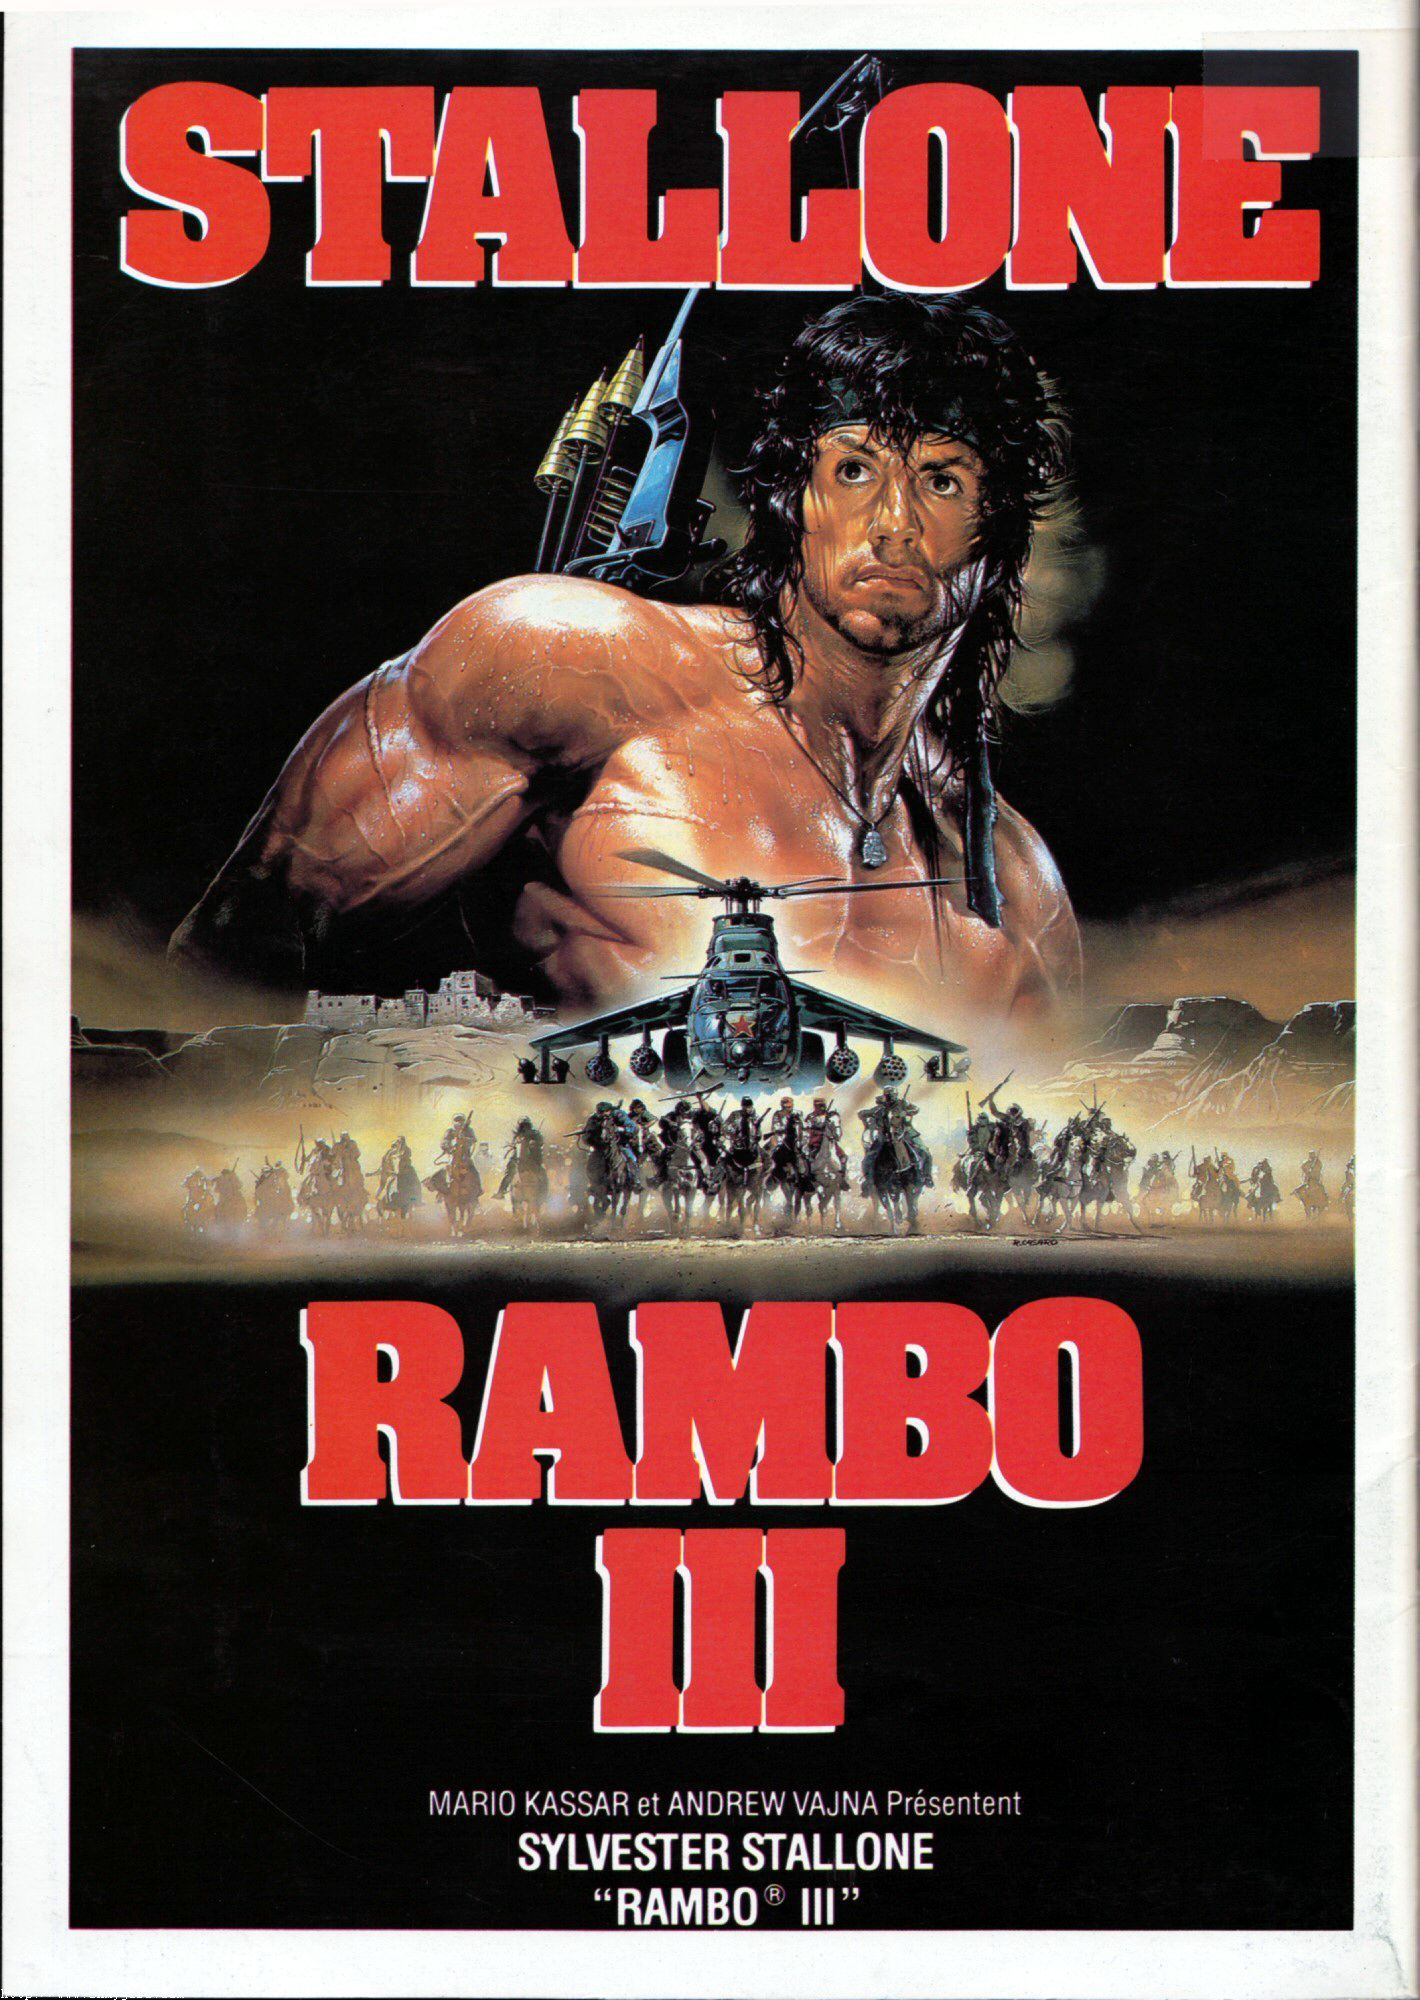 Rambo Iii Hd Wallpapers, Desktop Wallpaper - Rambo Iii 1988 Movie Posters - HD Wallpaper